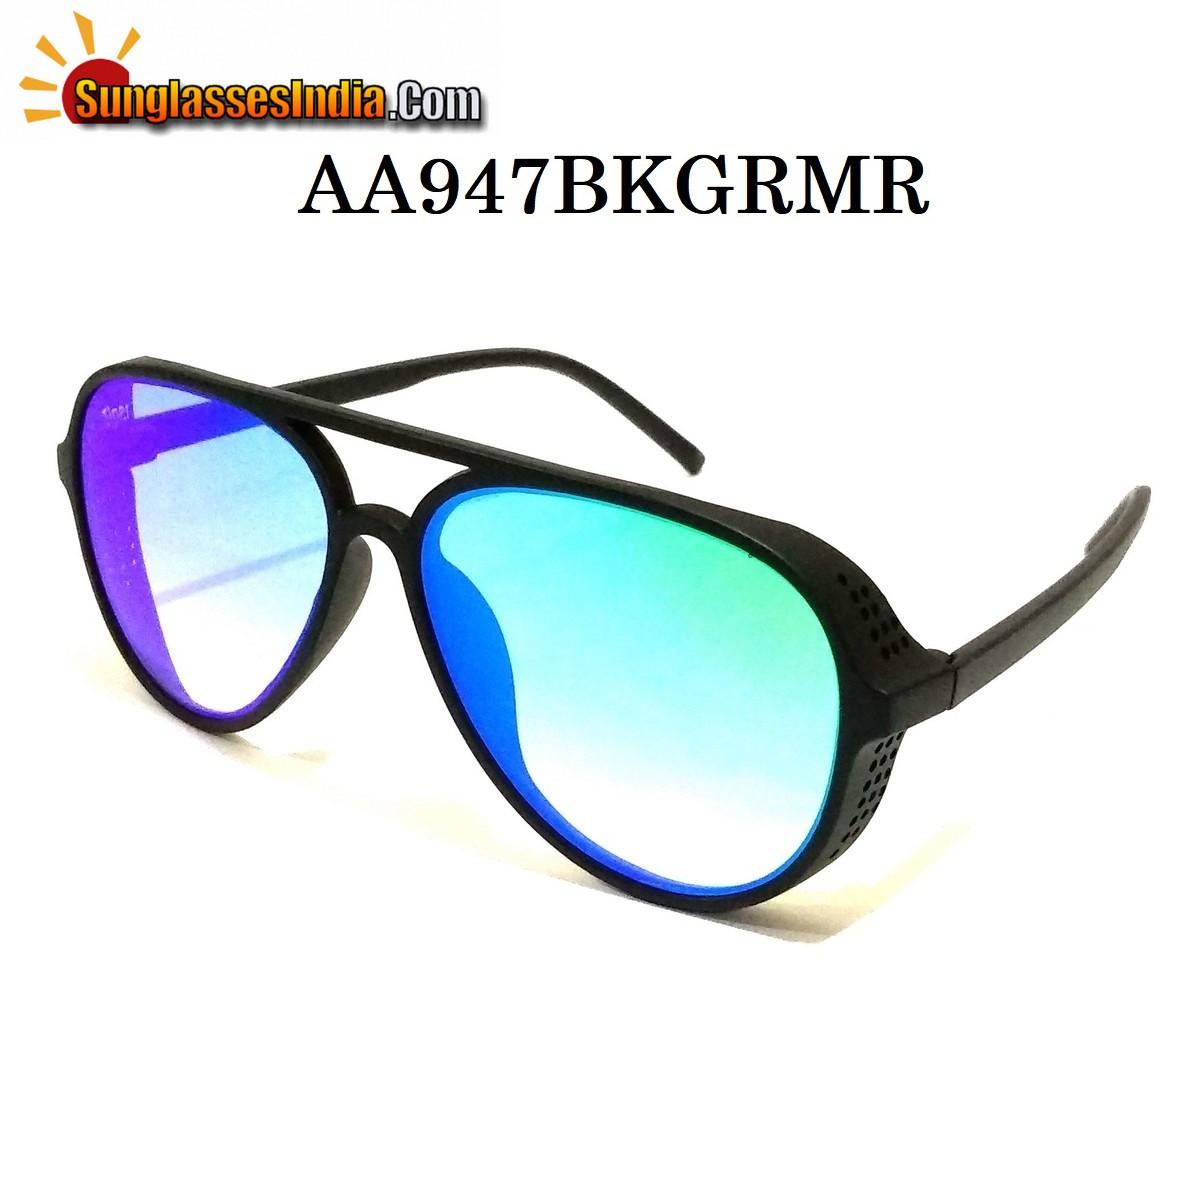 Green Mirror Side Cup Fashion Steampunk Sunglasses